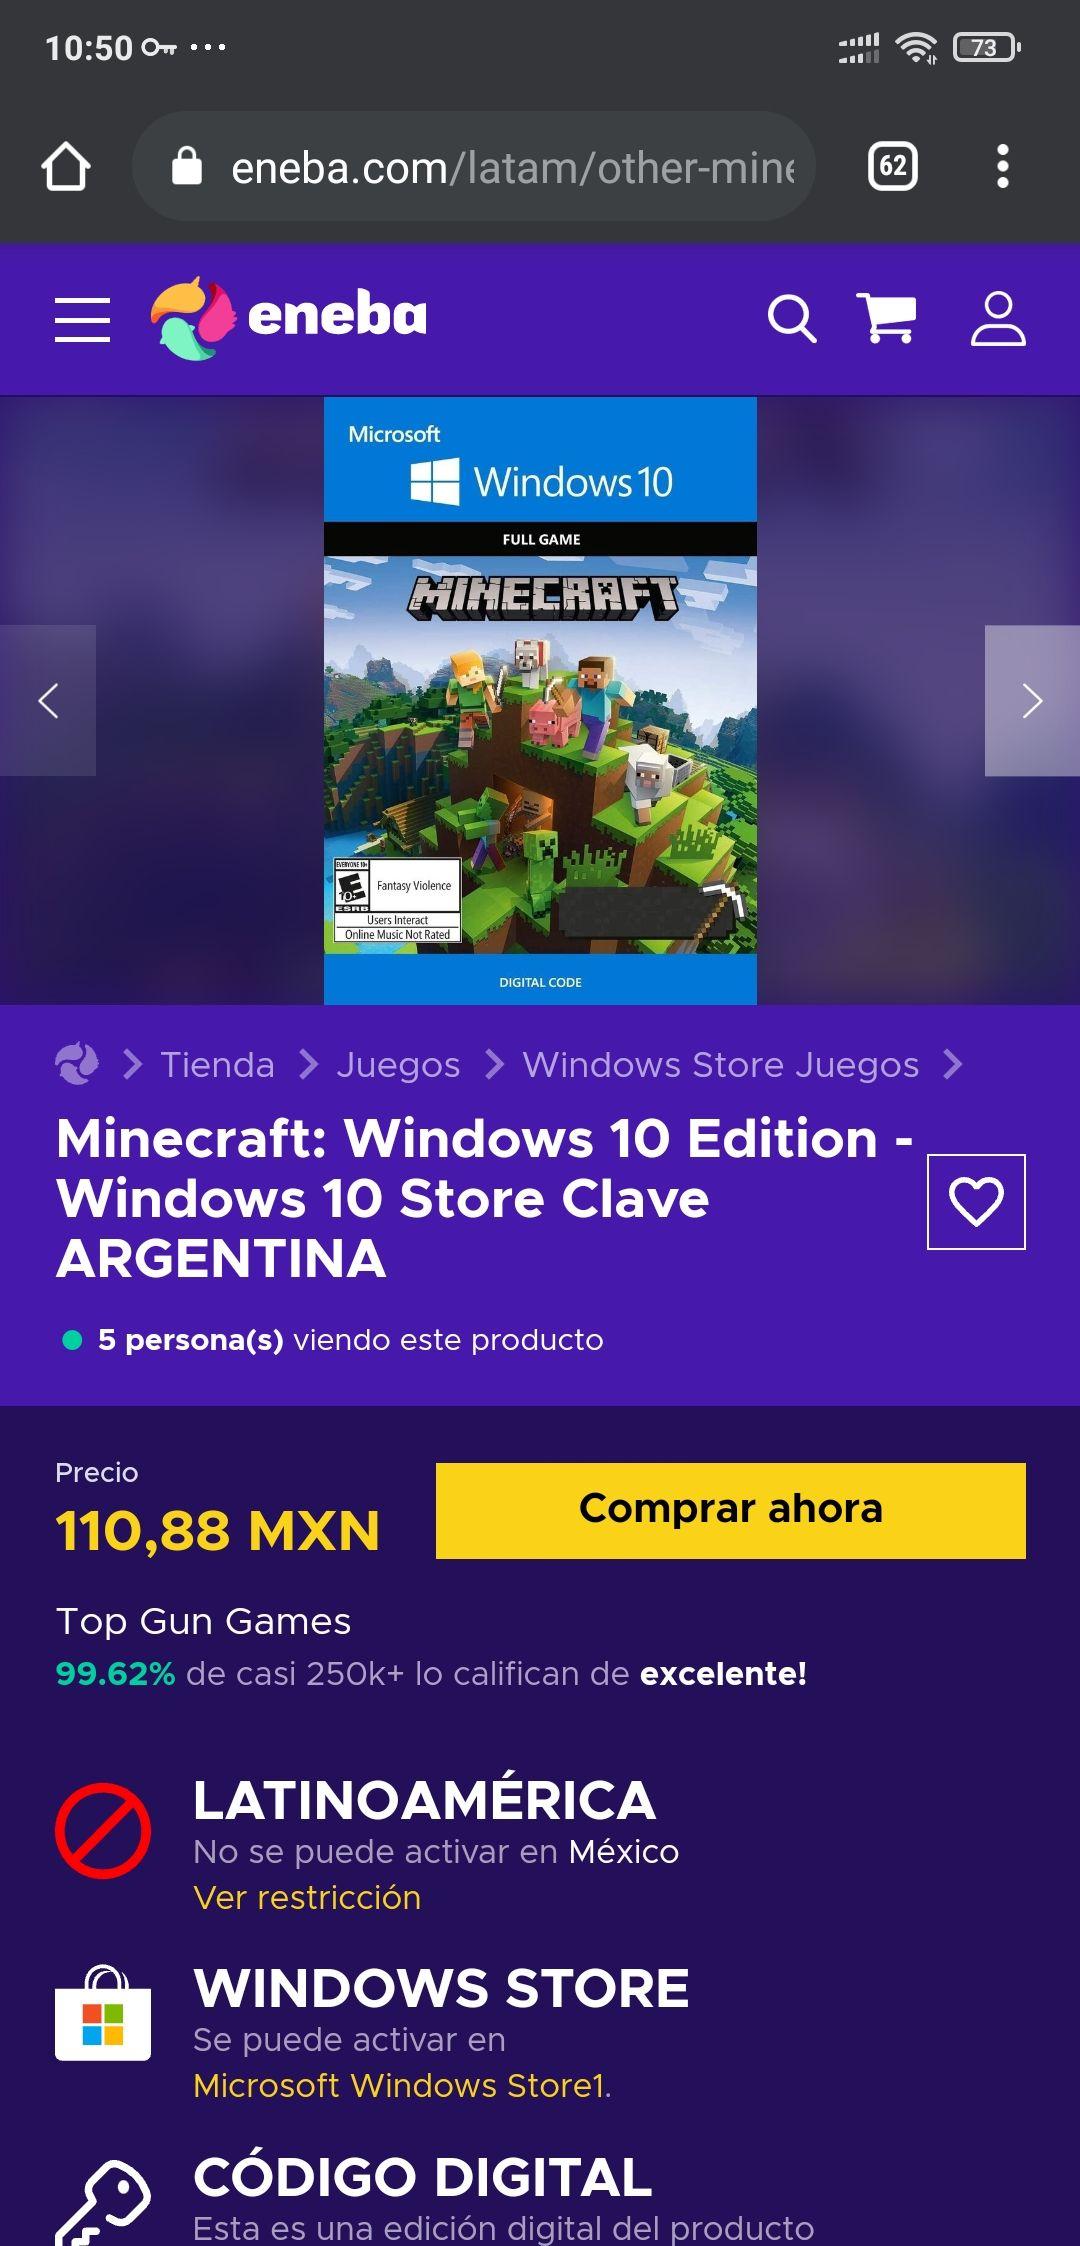 Eneba, Minecraft Windows 10 $111 pesos